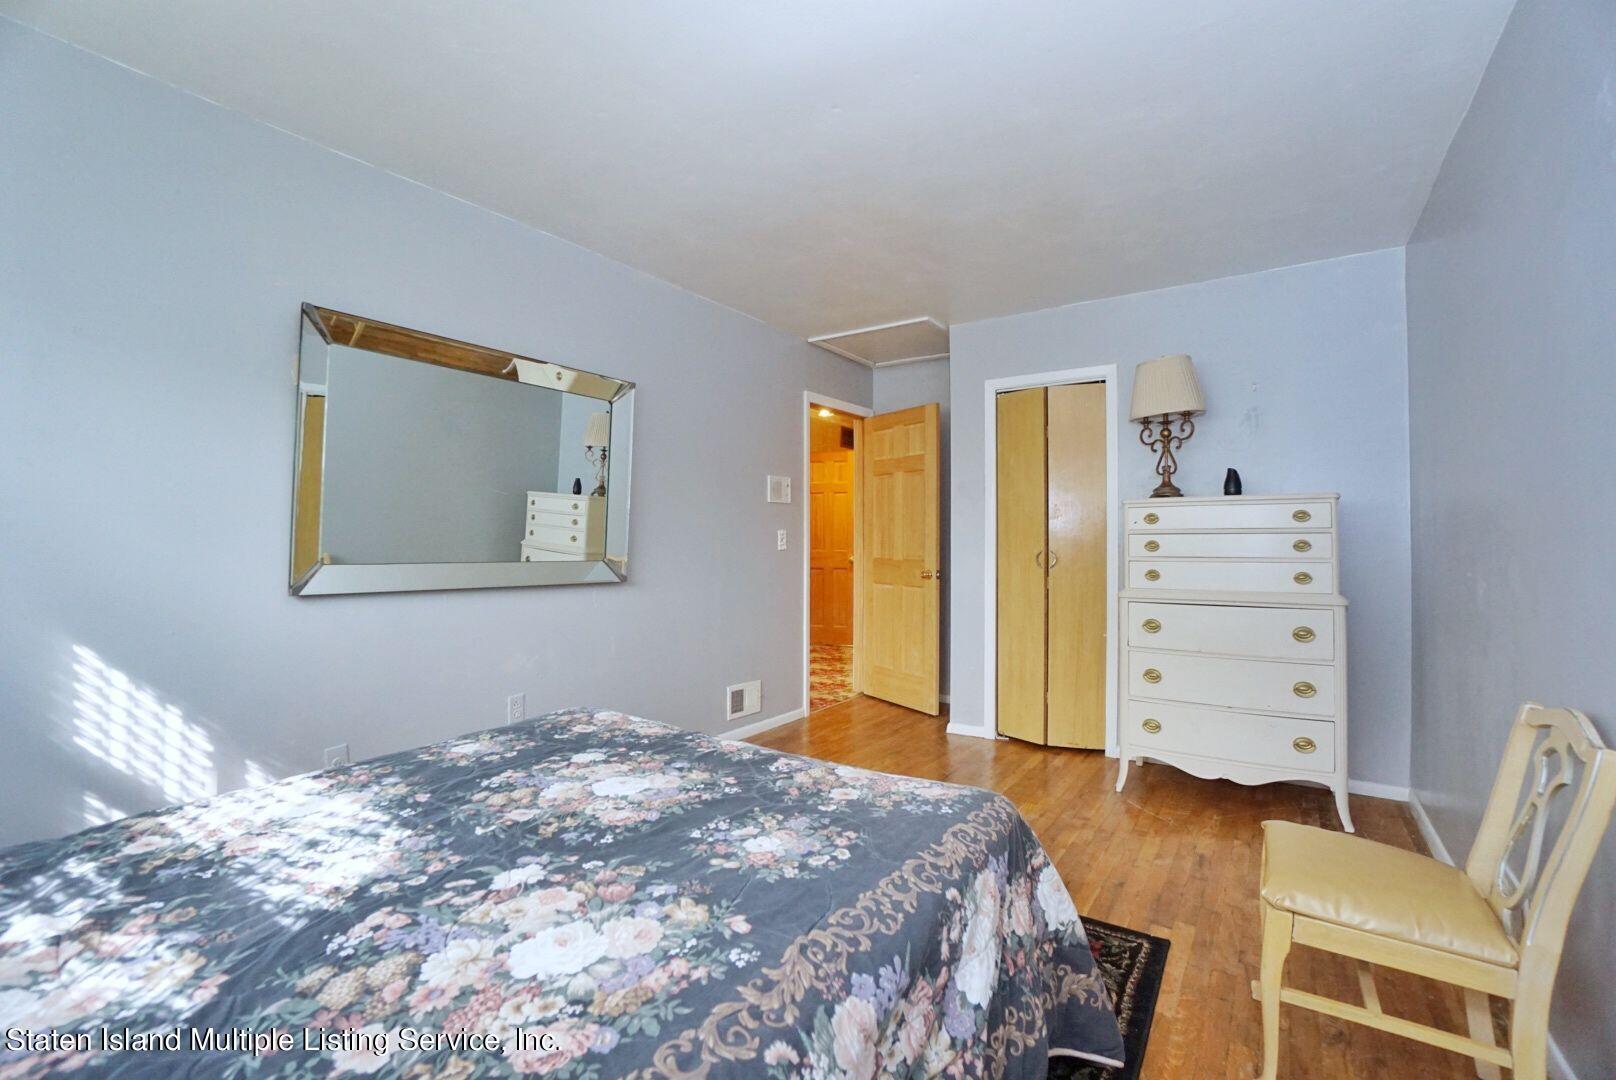 Single Family - Detached 94 Cranford Avenue  Staten Island, NY 10306, MLS-1146620-32